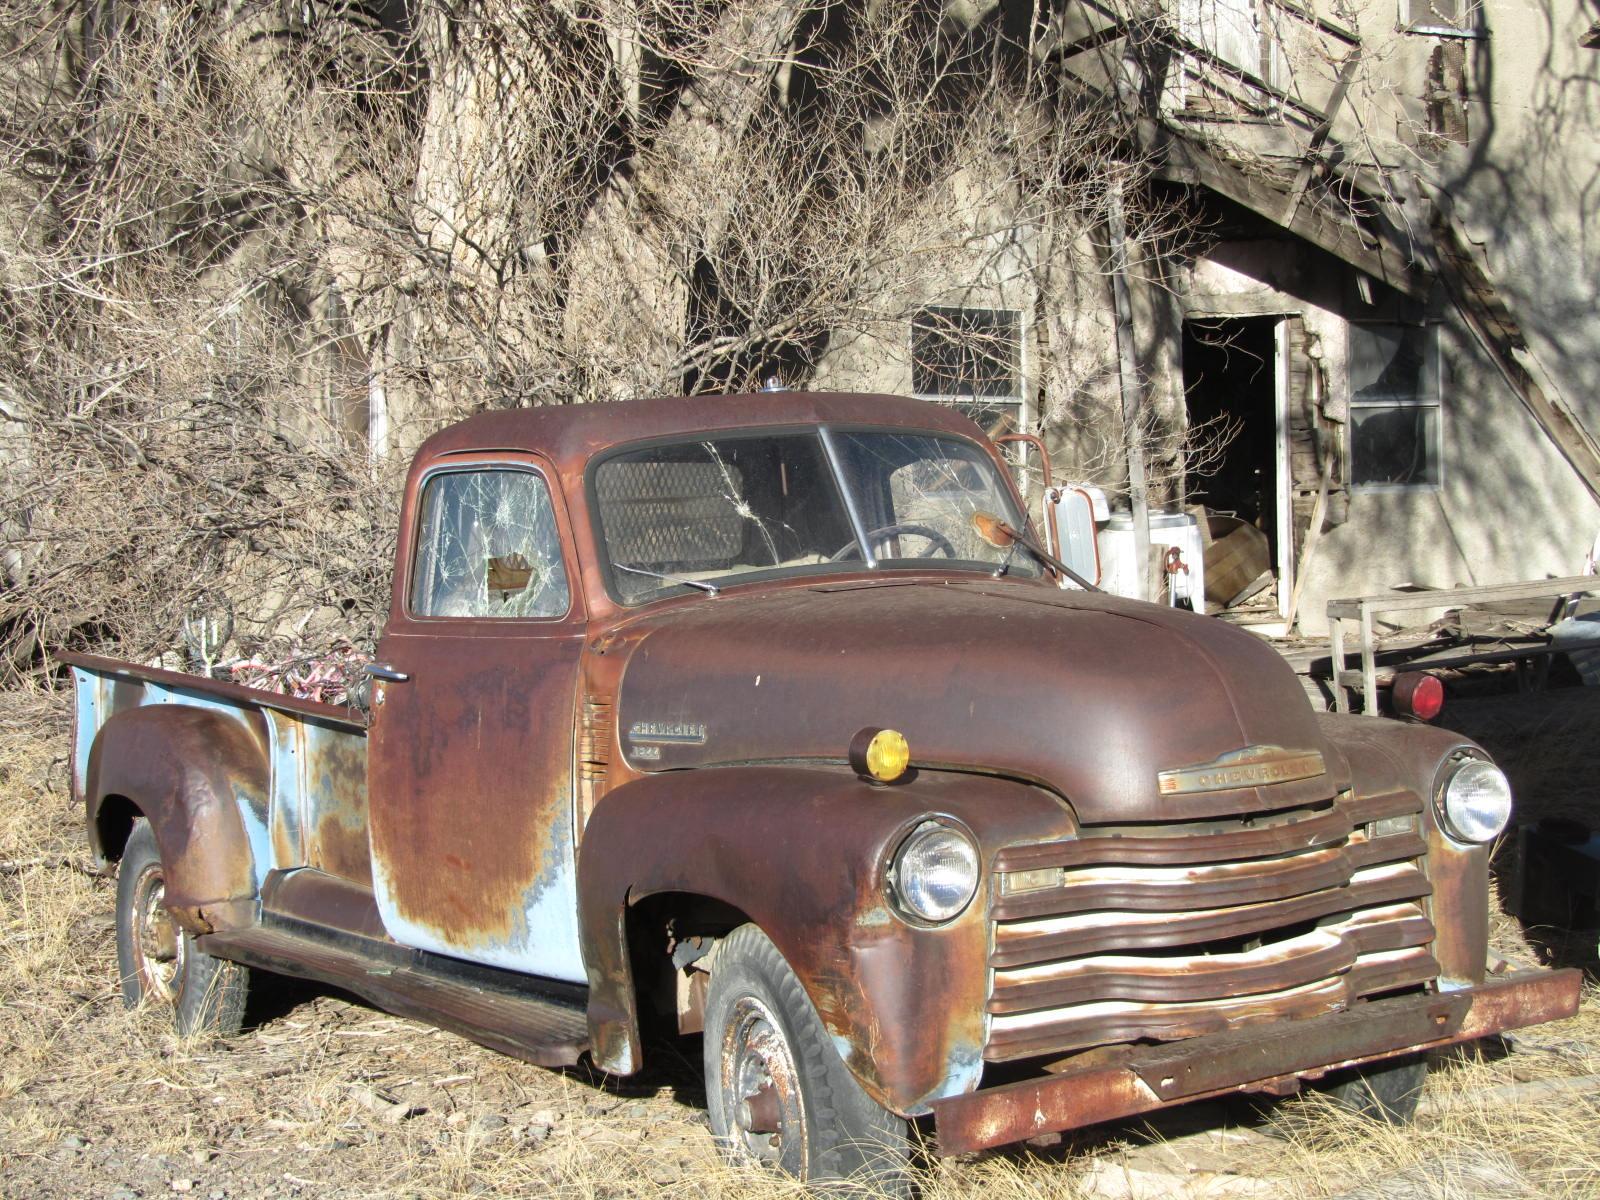 autoliterate: 1950 Chevrolet 3800, Des Moines, New Mexico